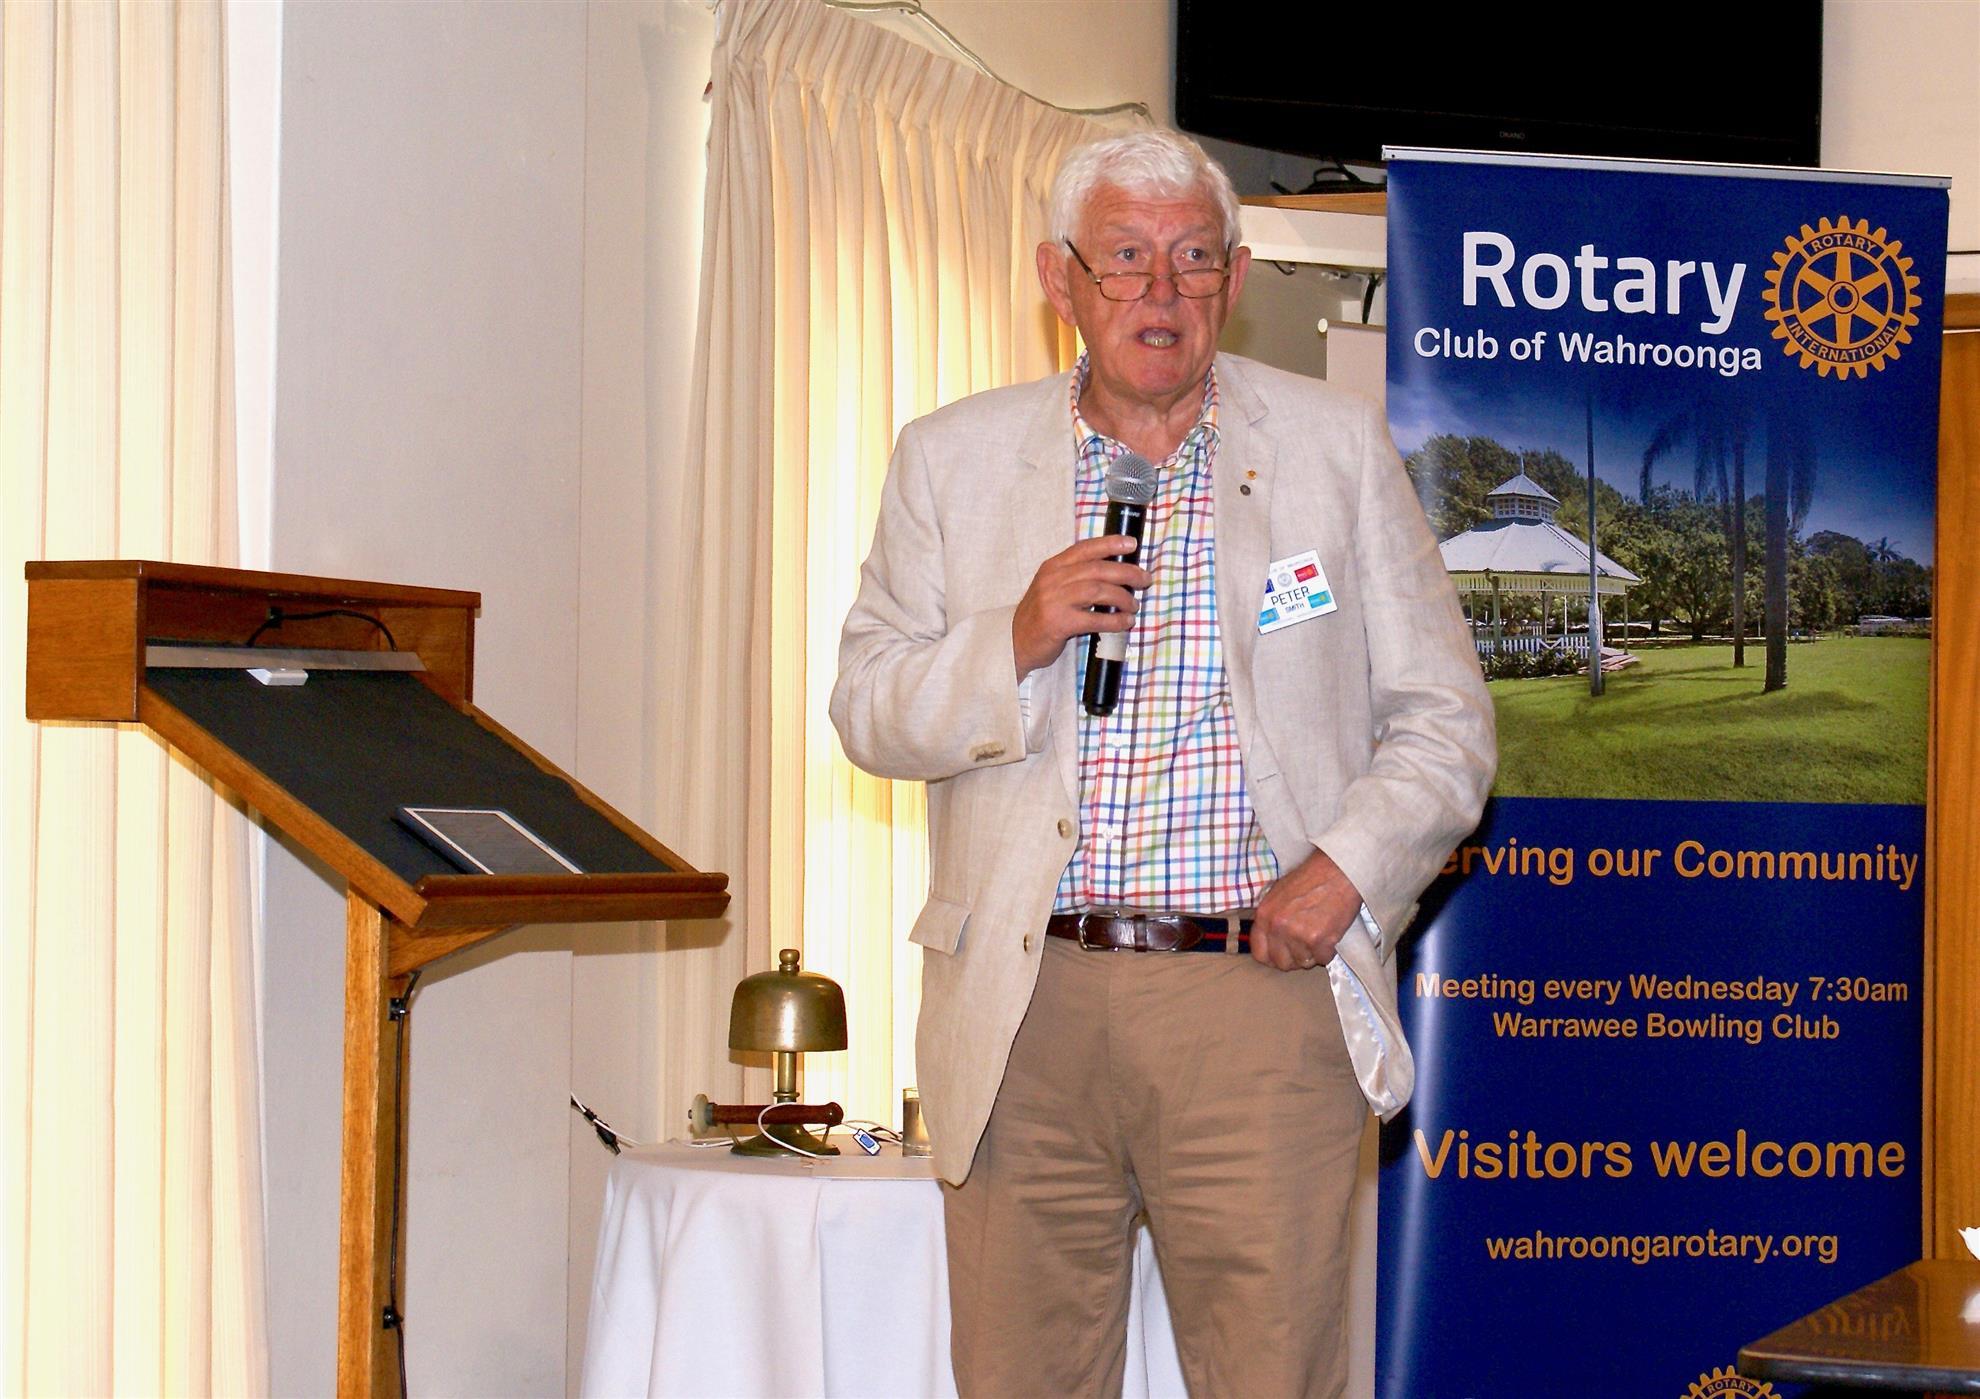 Stories | Rotary Club of Wahroonga